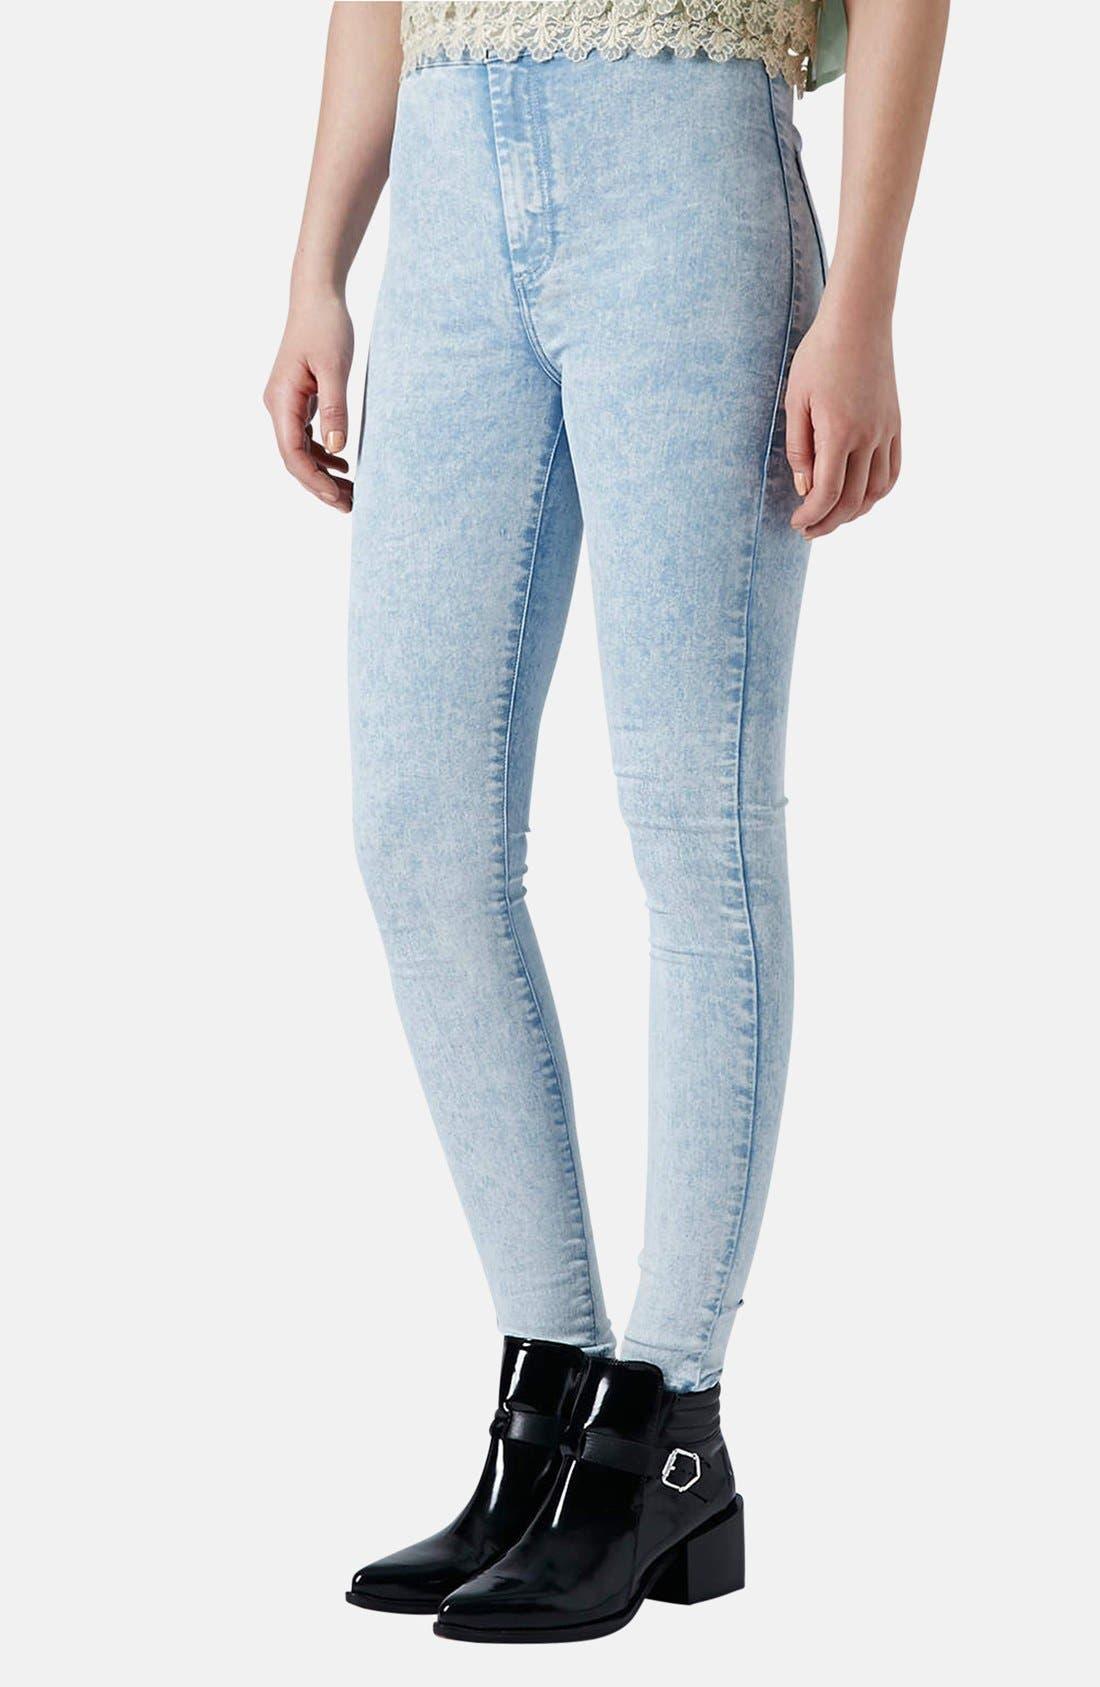 Alternate Image 1 Selected - Topshop Moto 'Joni' Acid Wash High Rise Skinny Jeans (Light) (Regular & Short)